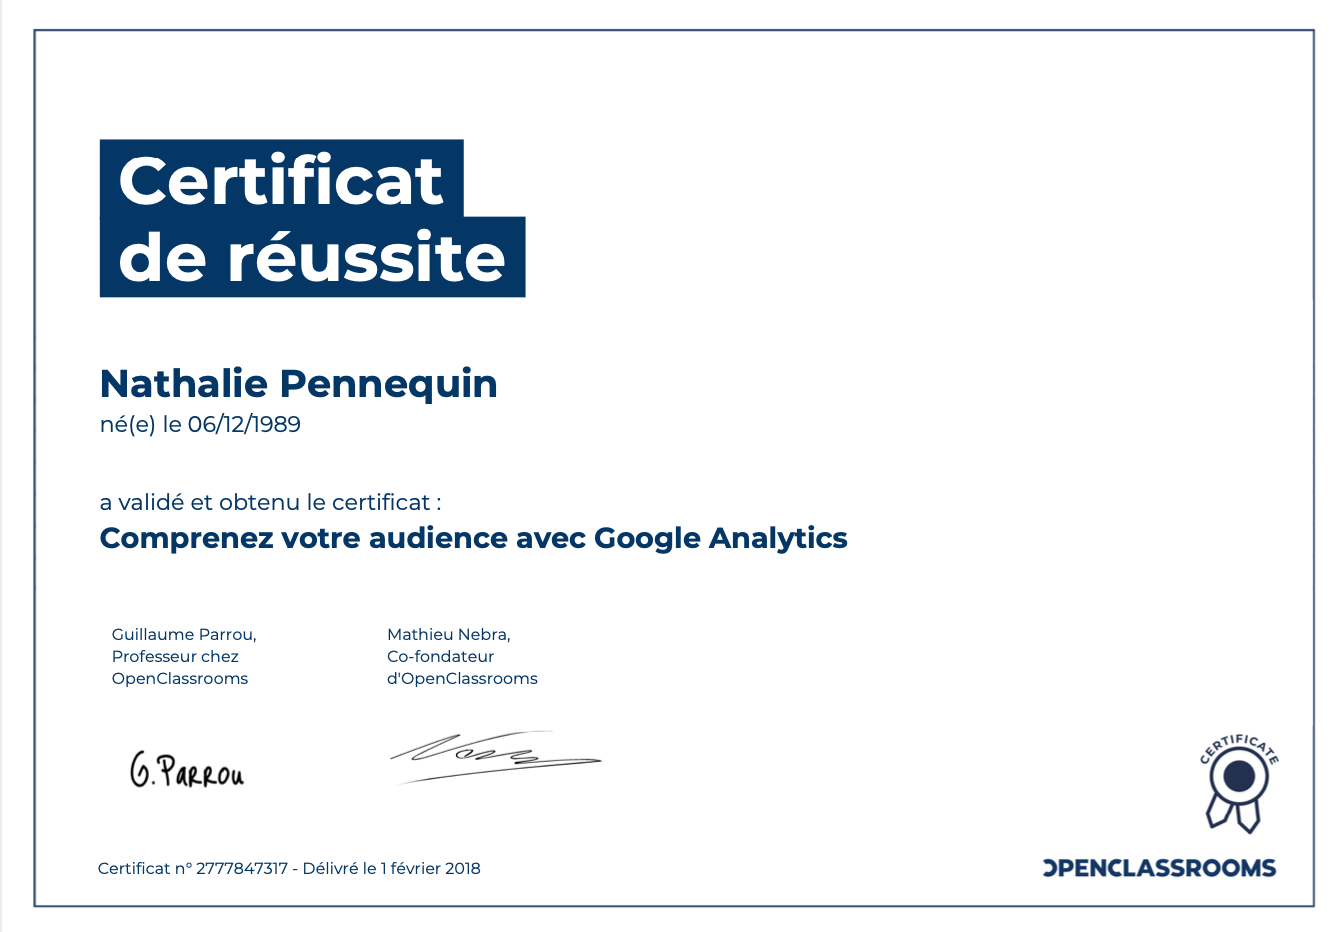 Comprenez votre audience avec Google Analytics